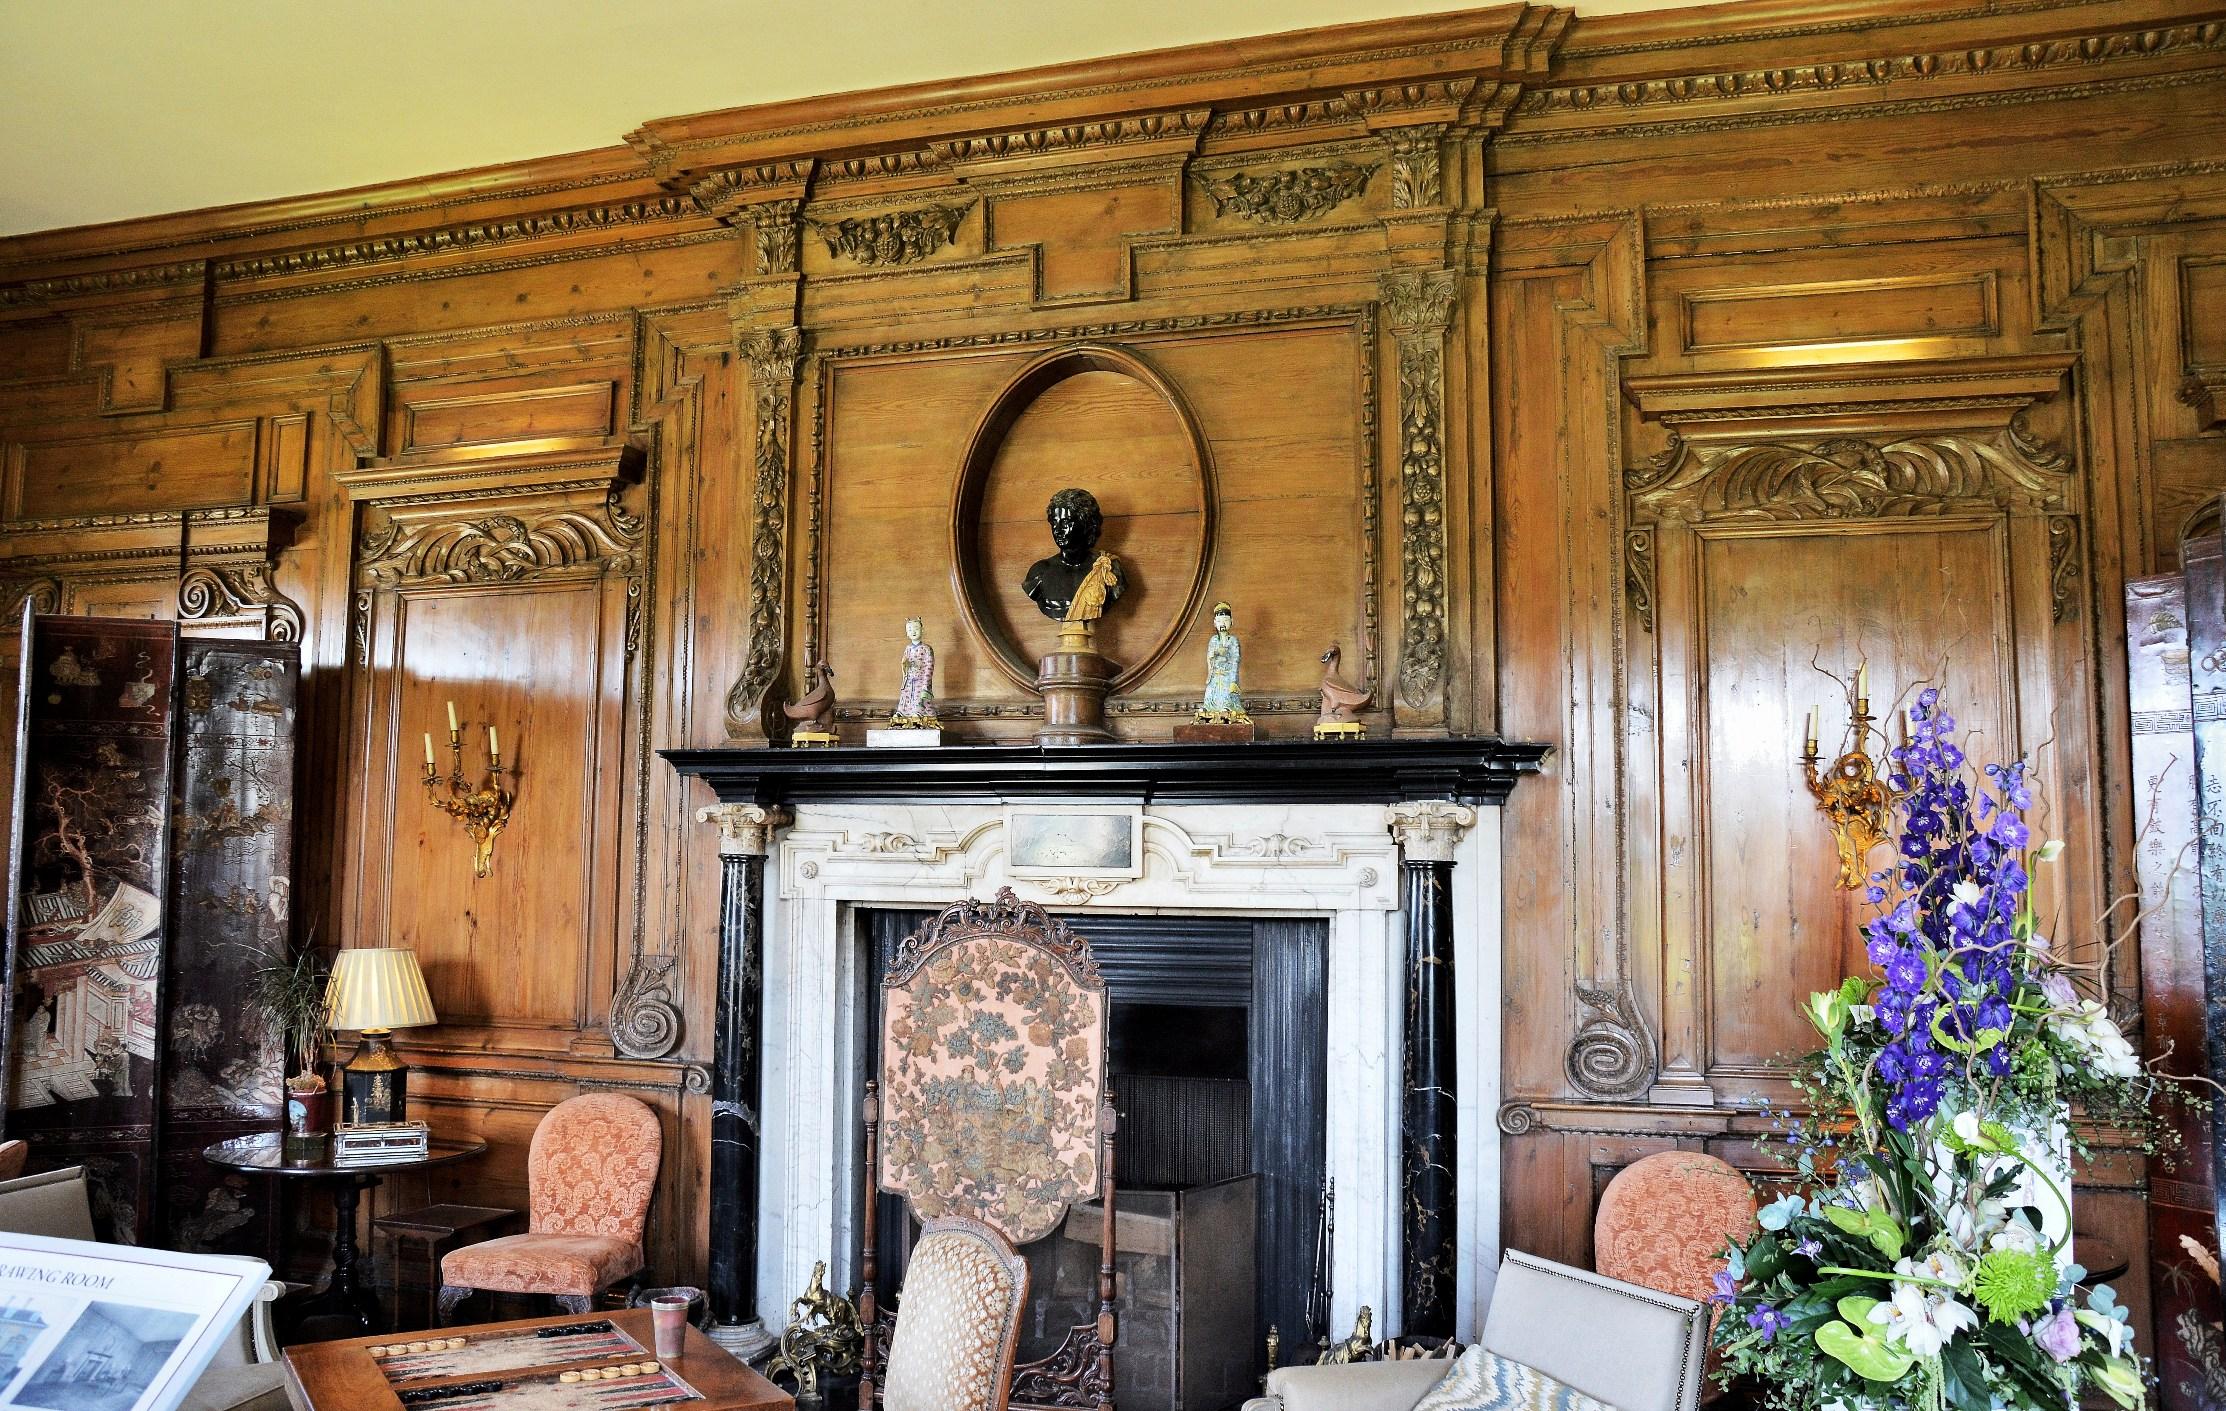 Leeds Castle Interiors  Picture This uk